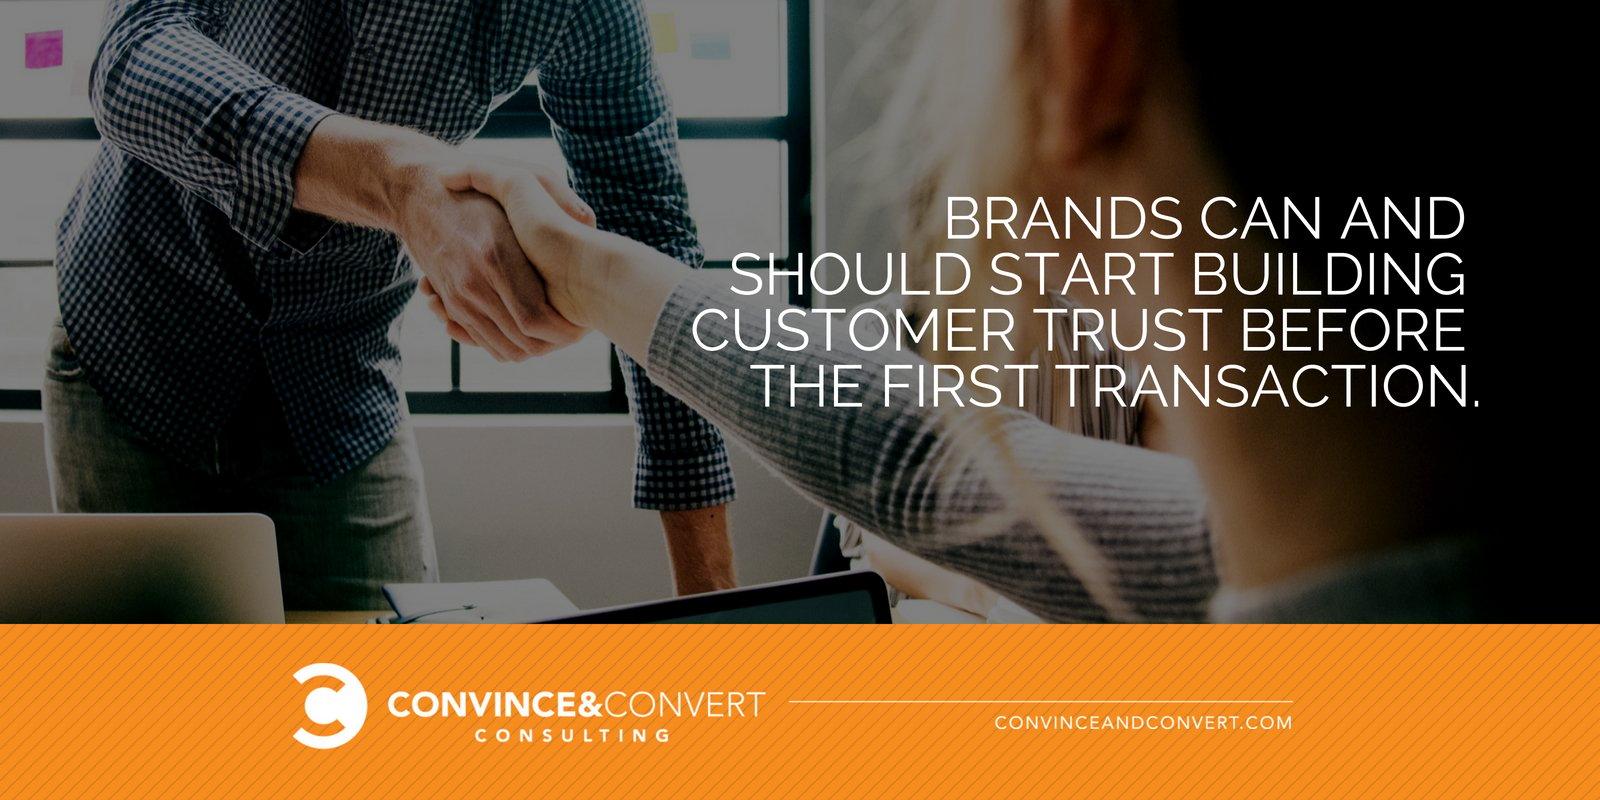 Build customer trust